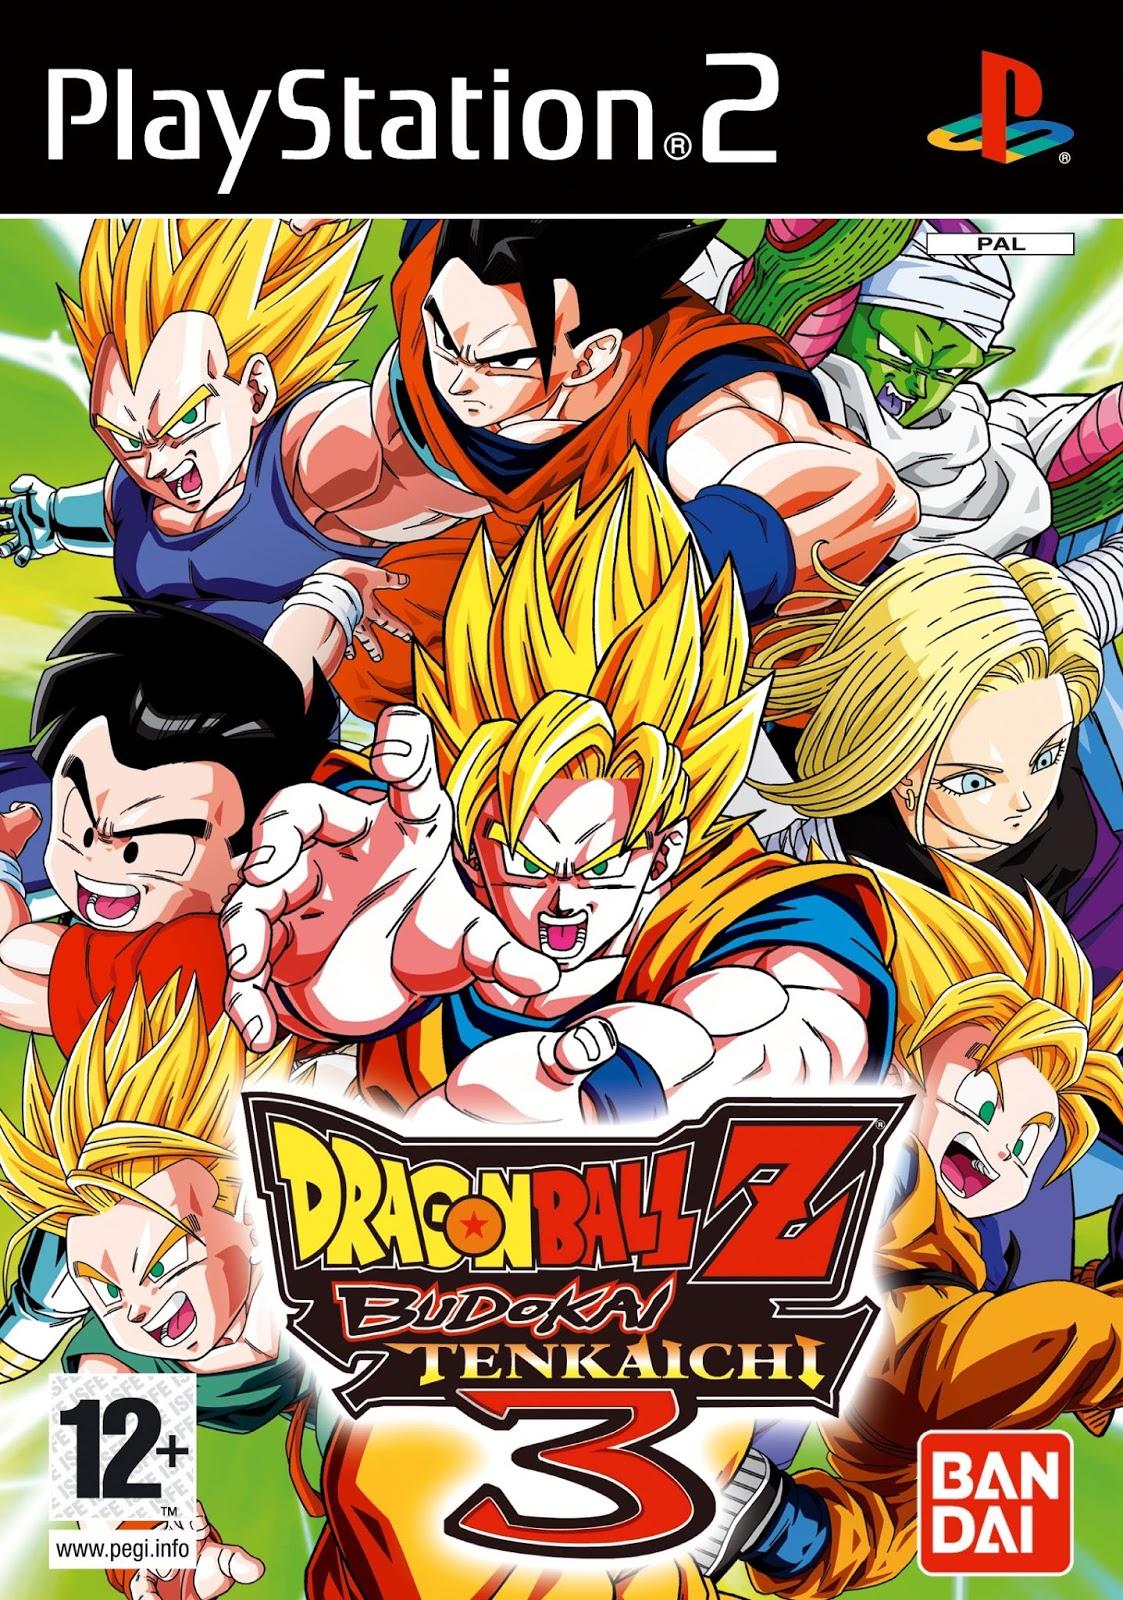 Download dbz tenkaichi